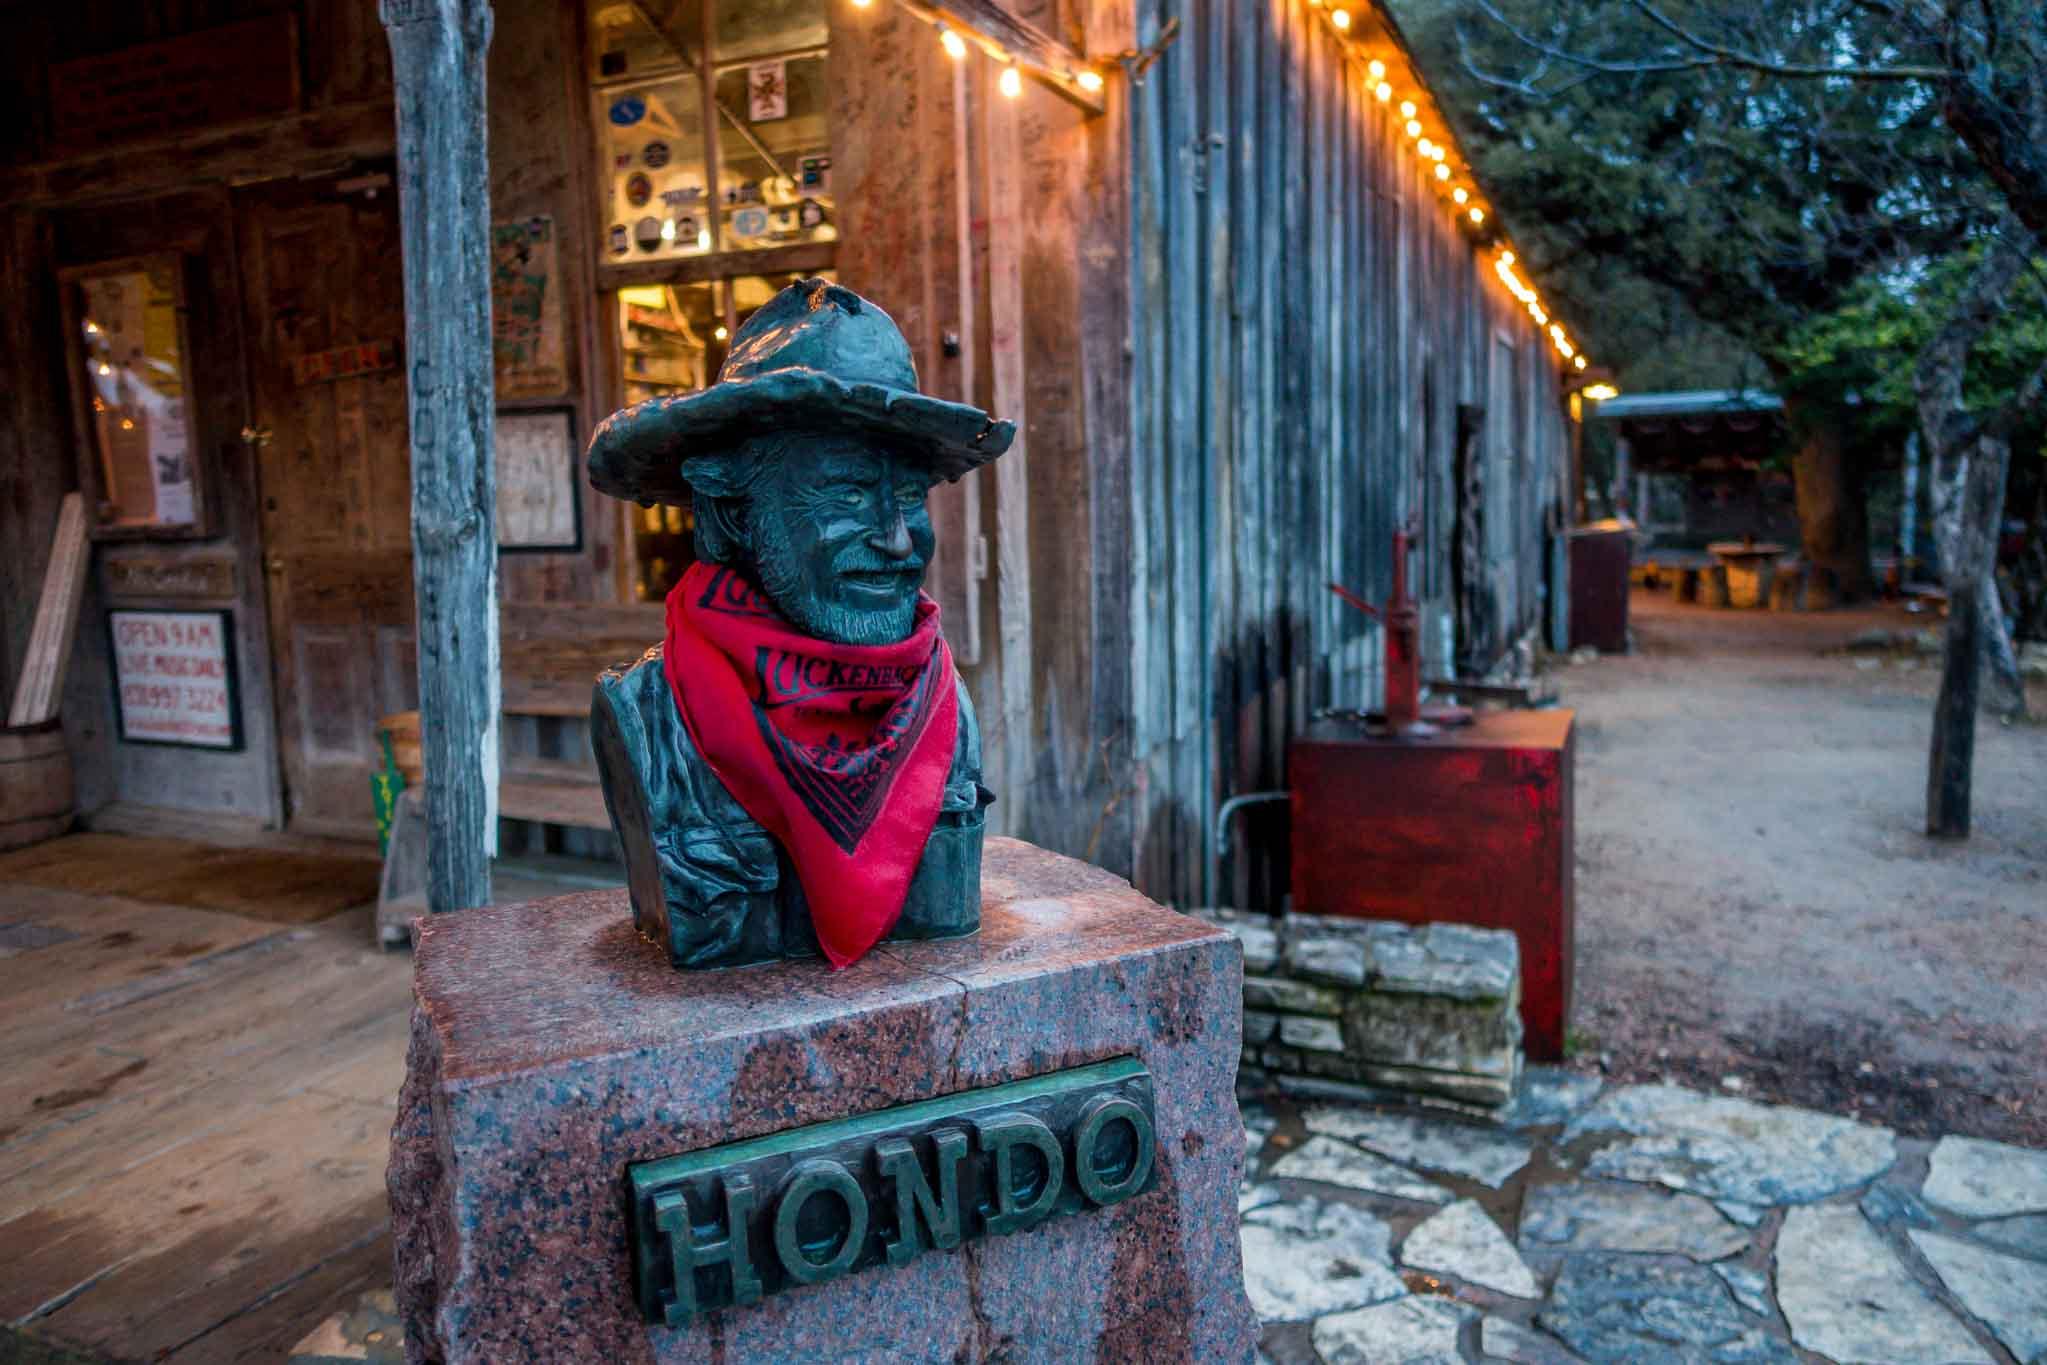 Small bust of Hondo Crouch wearing bandana